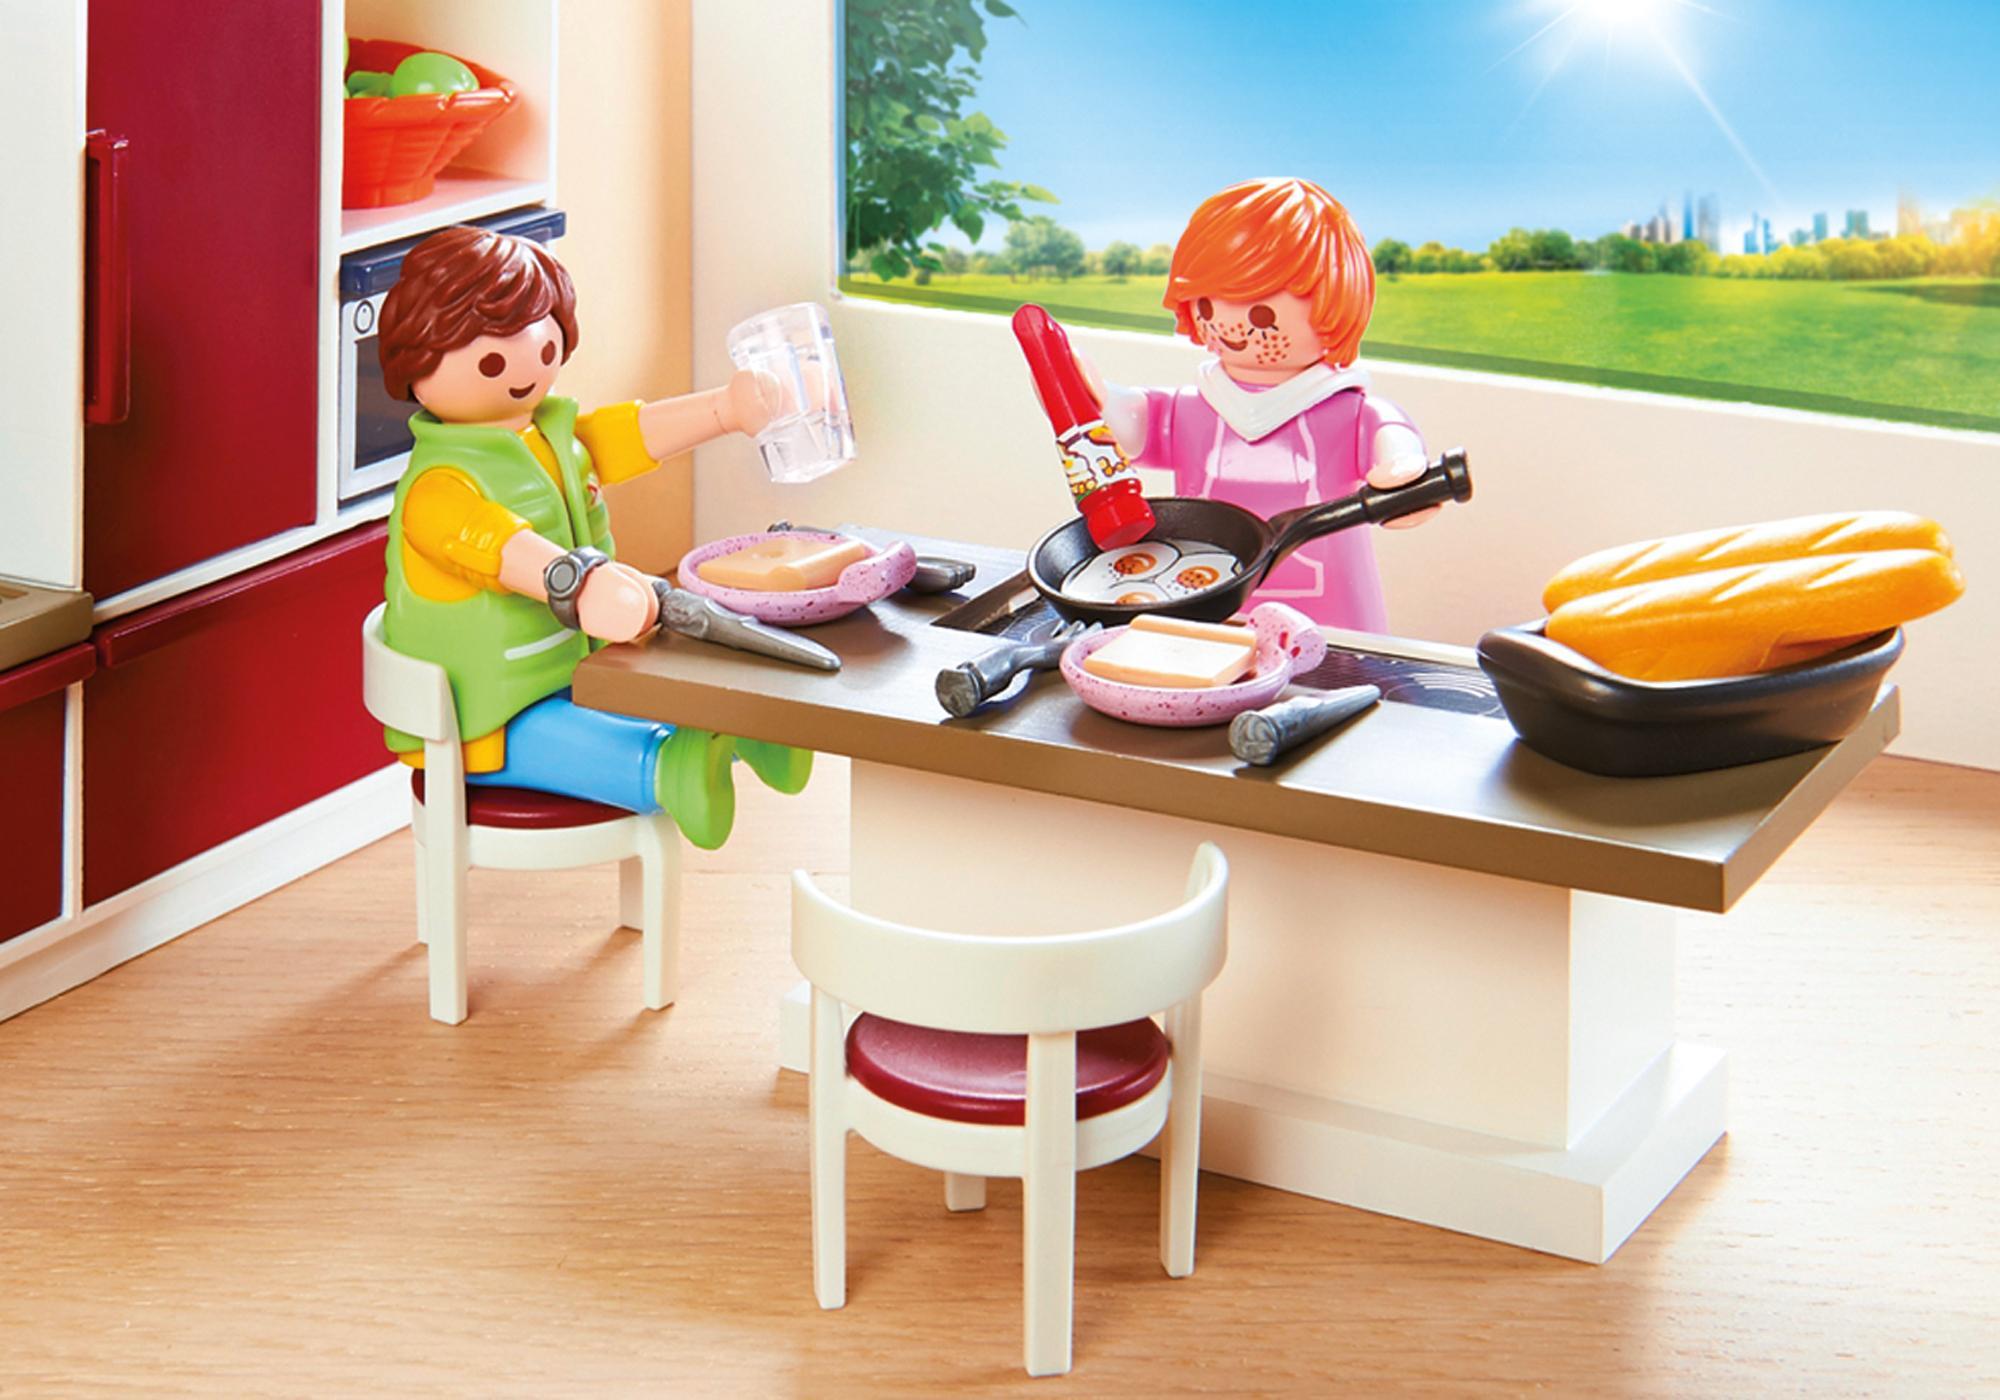 http://media.playmobil.com/i/playmobil/9269_product_extra1/Grande cucina attrezzata